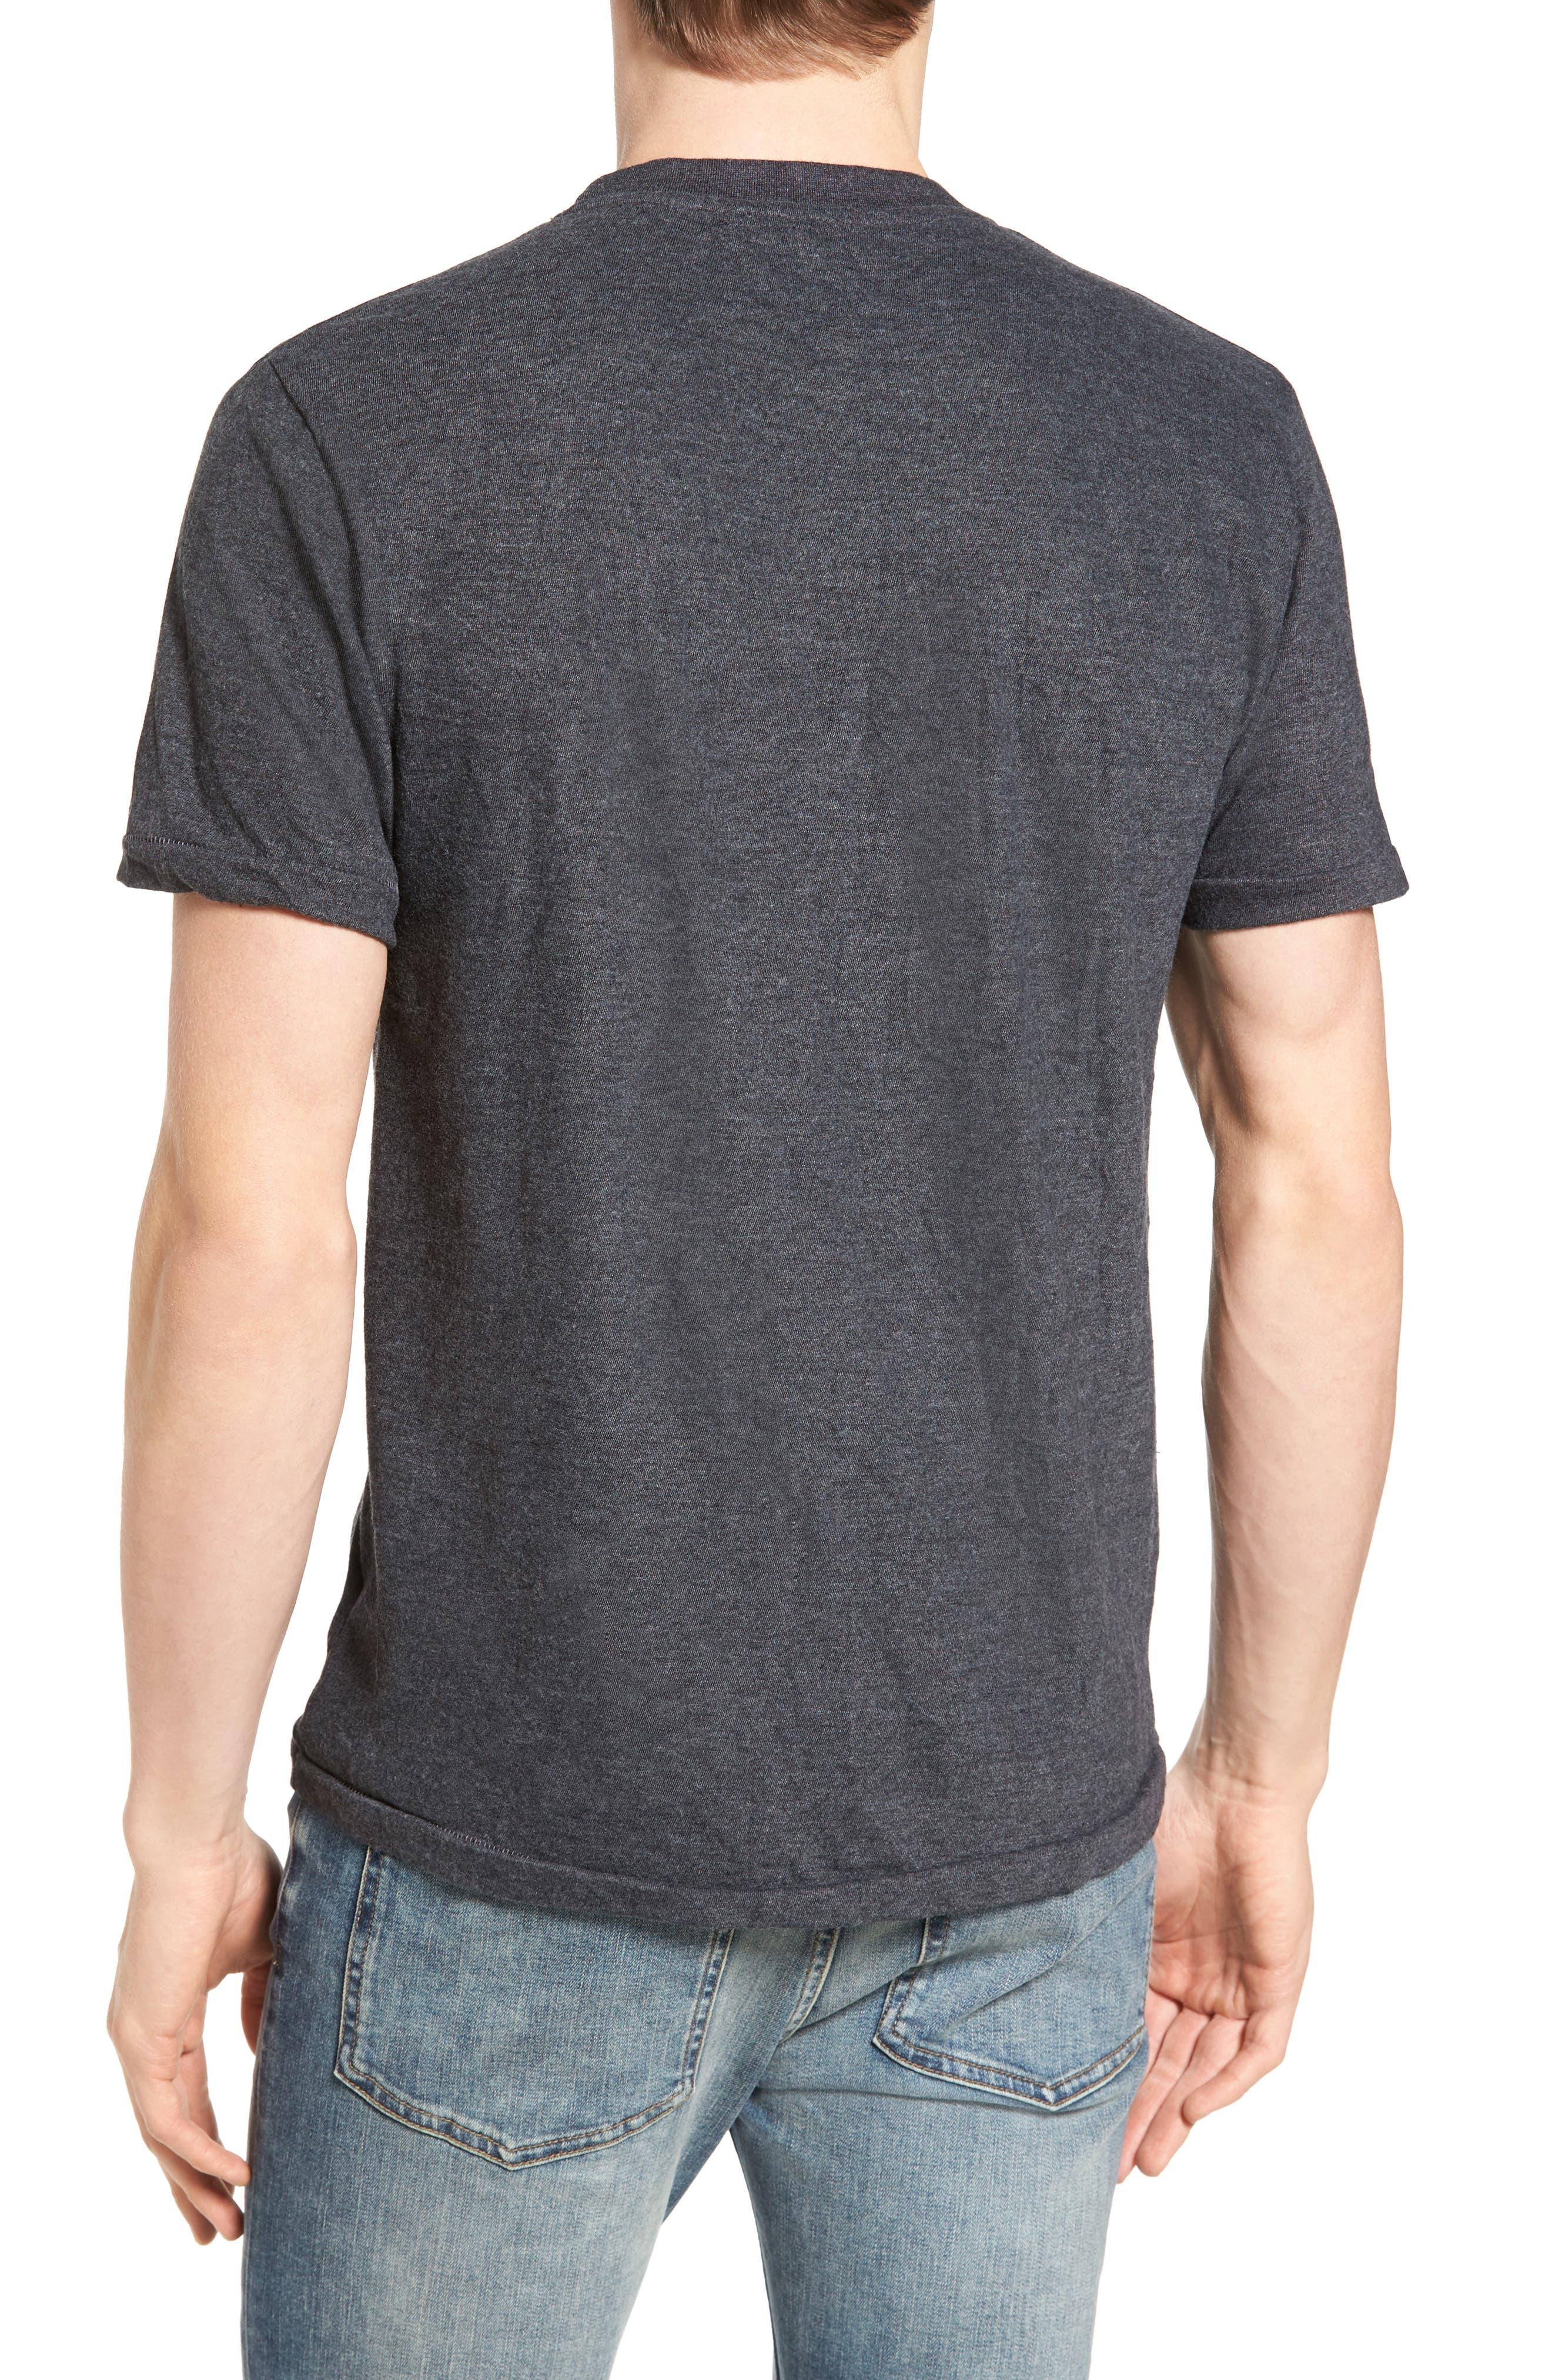 Hillwood San Francisco Giants T-Shirt,                             Alternate thumbnail 2, color,                             003